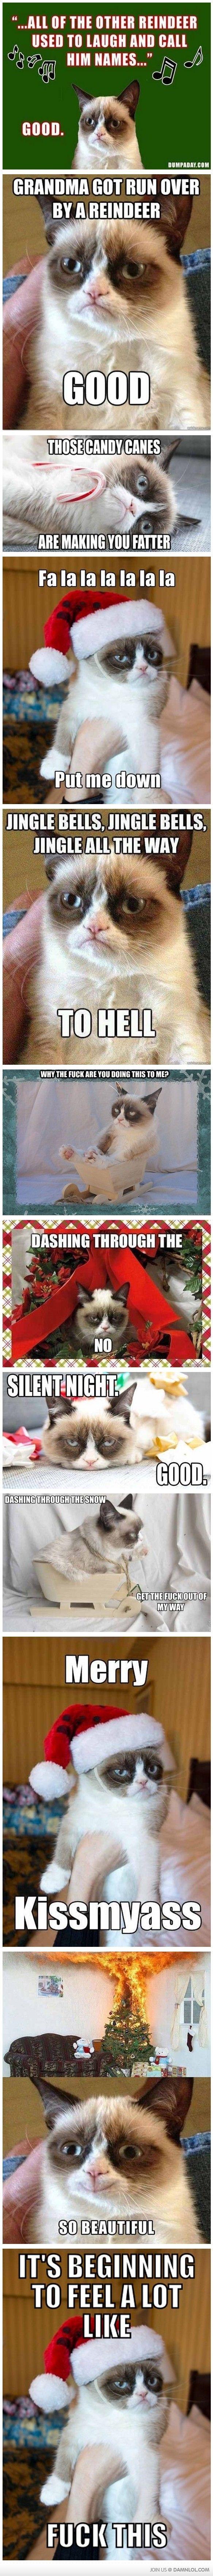 I LOVE grumpy cat.